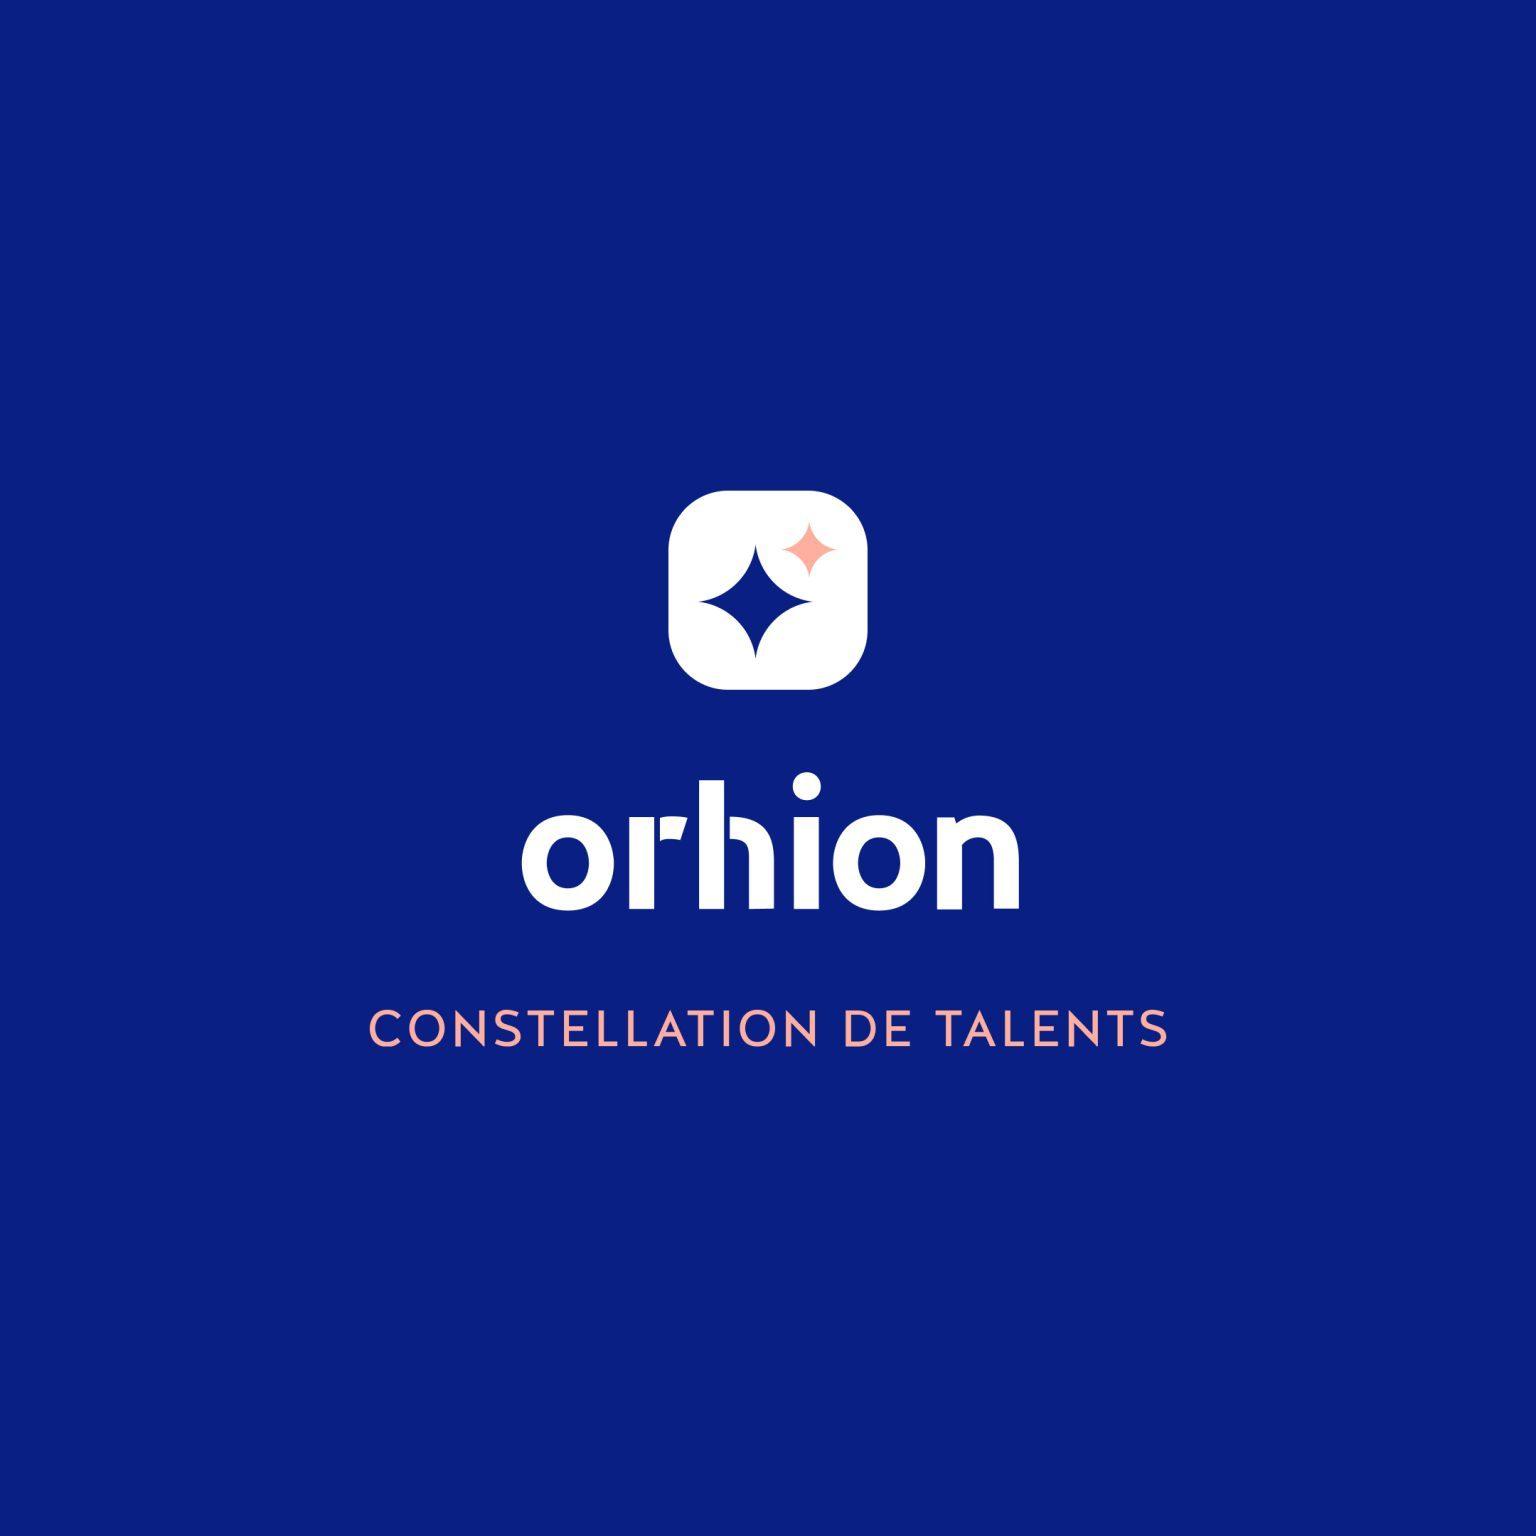 orhion logo - Agence Monette